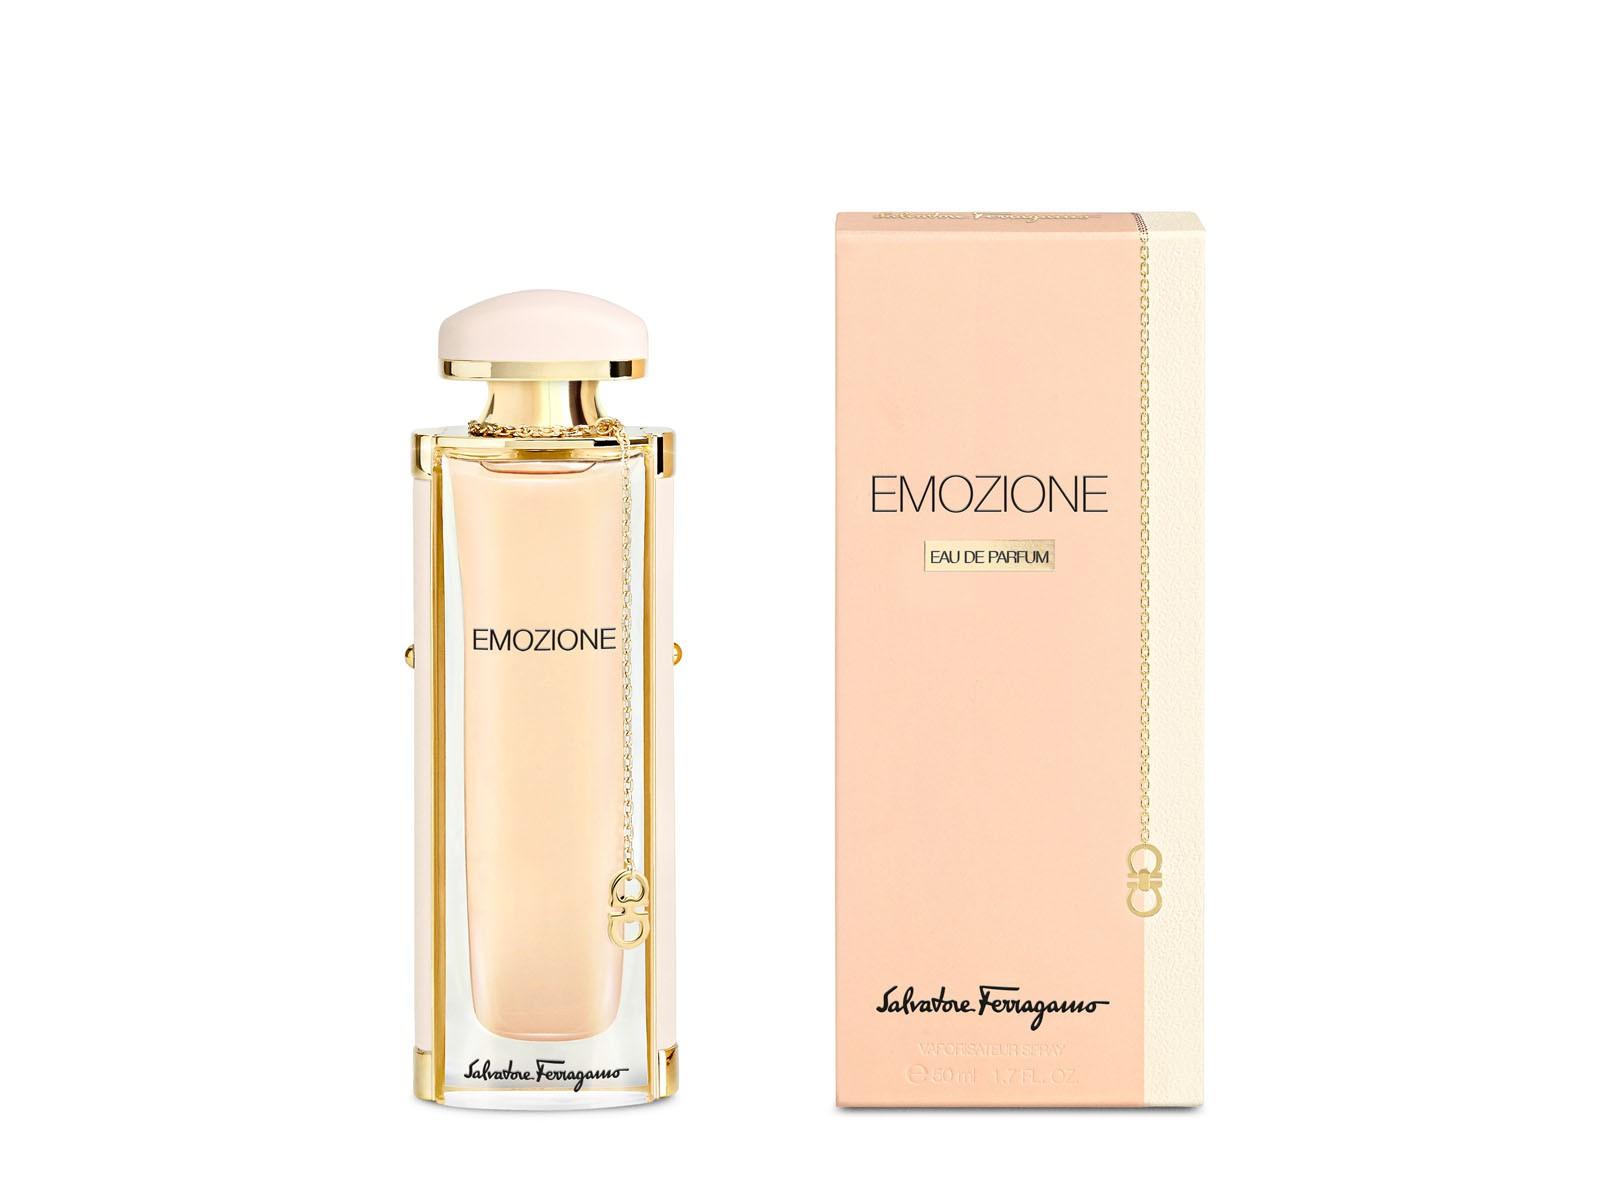 Salvatore Ferragamo Emozione аромат для женщин